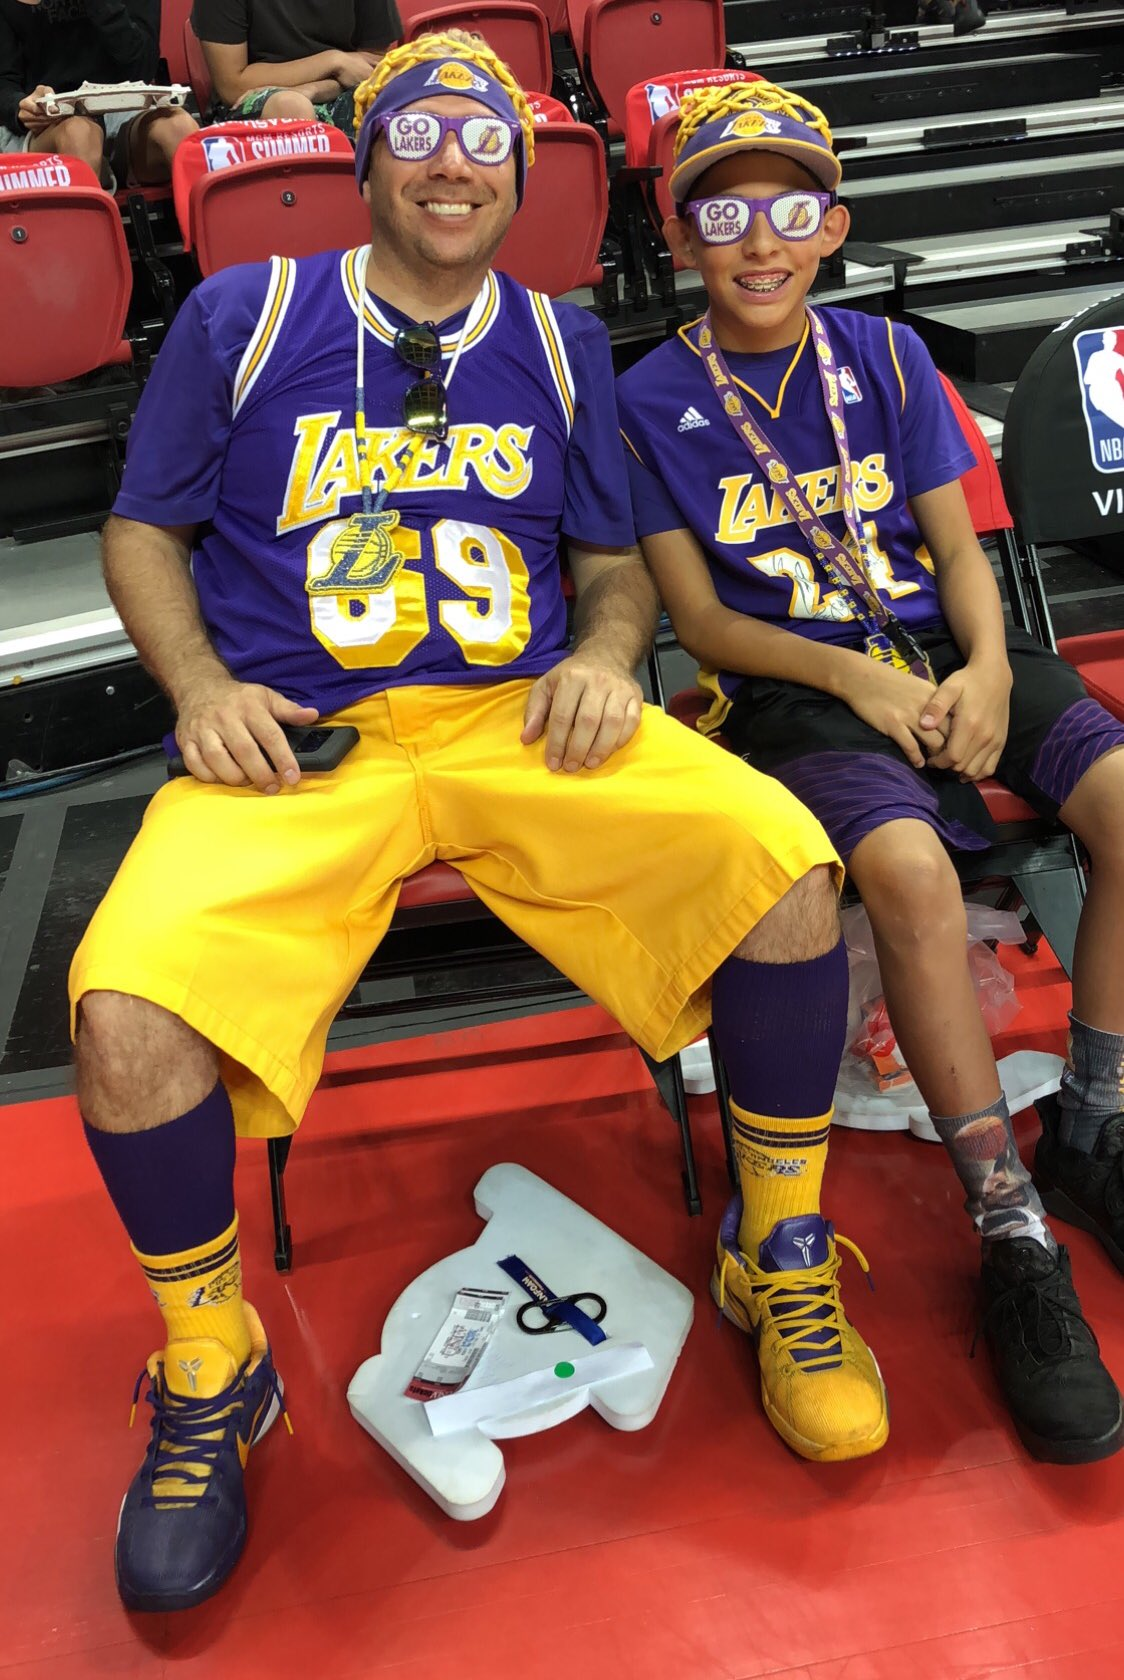 Laker nation is ready. #NBASummer https://t.co/jDwFjSZ2p0